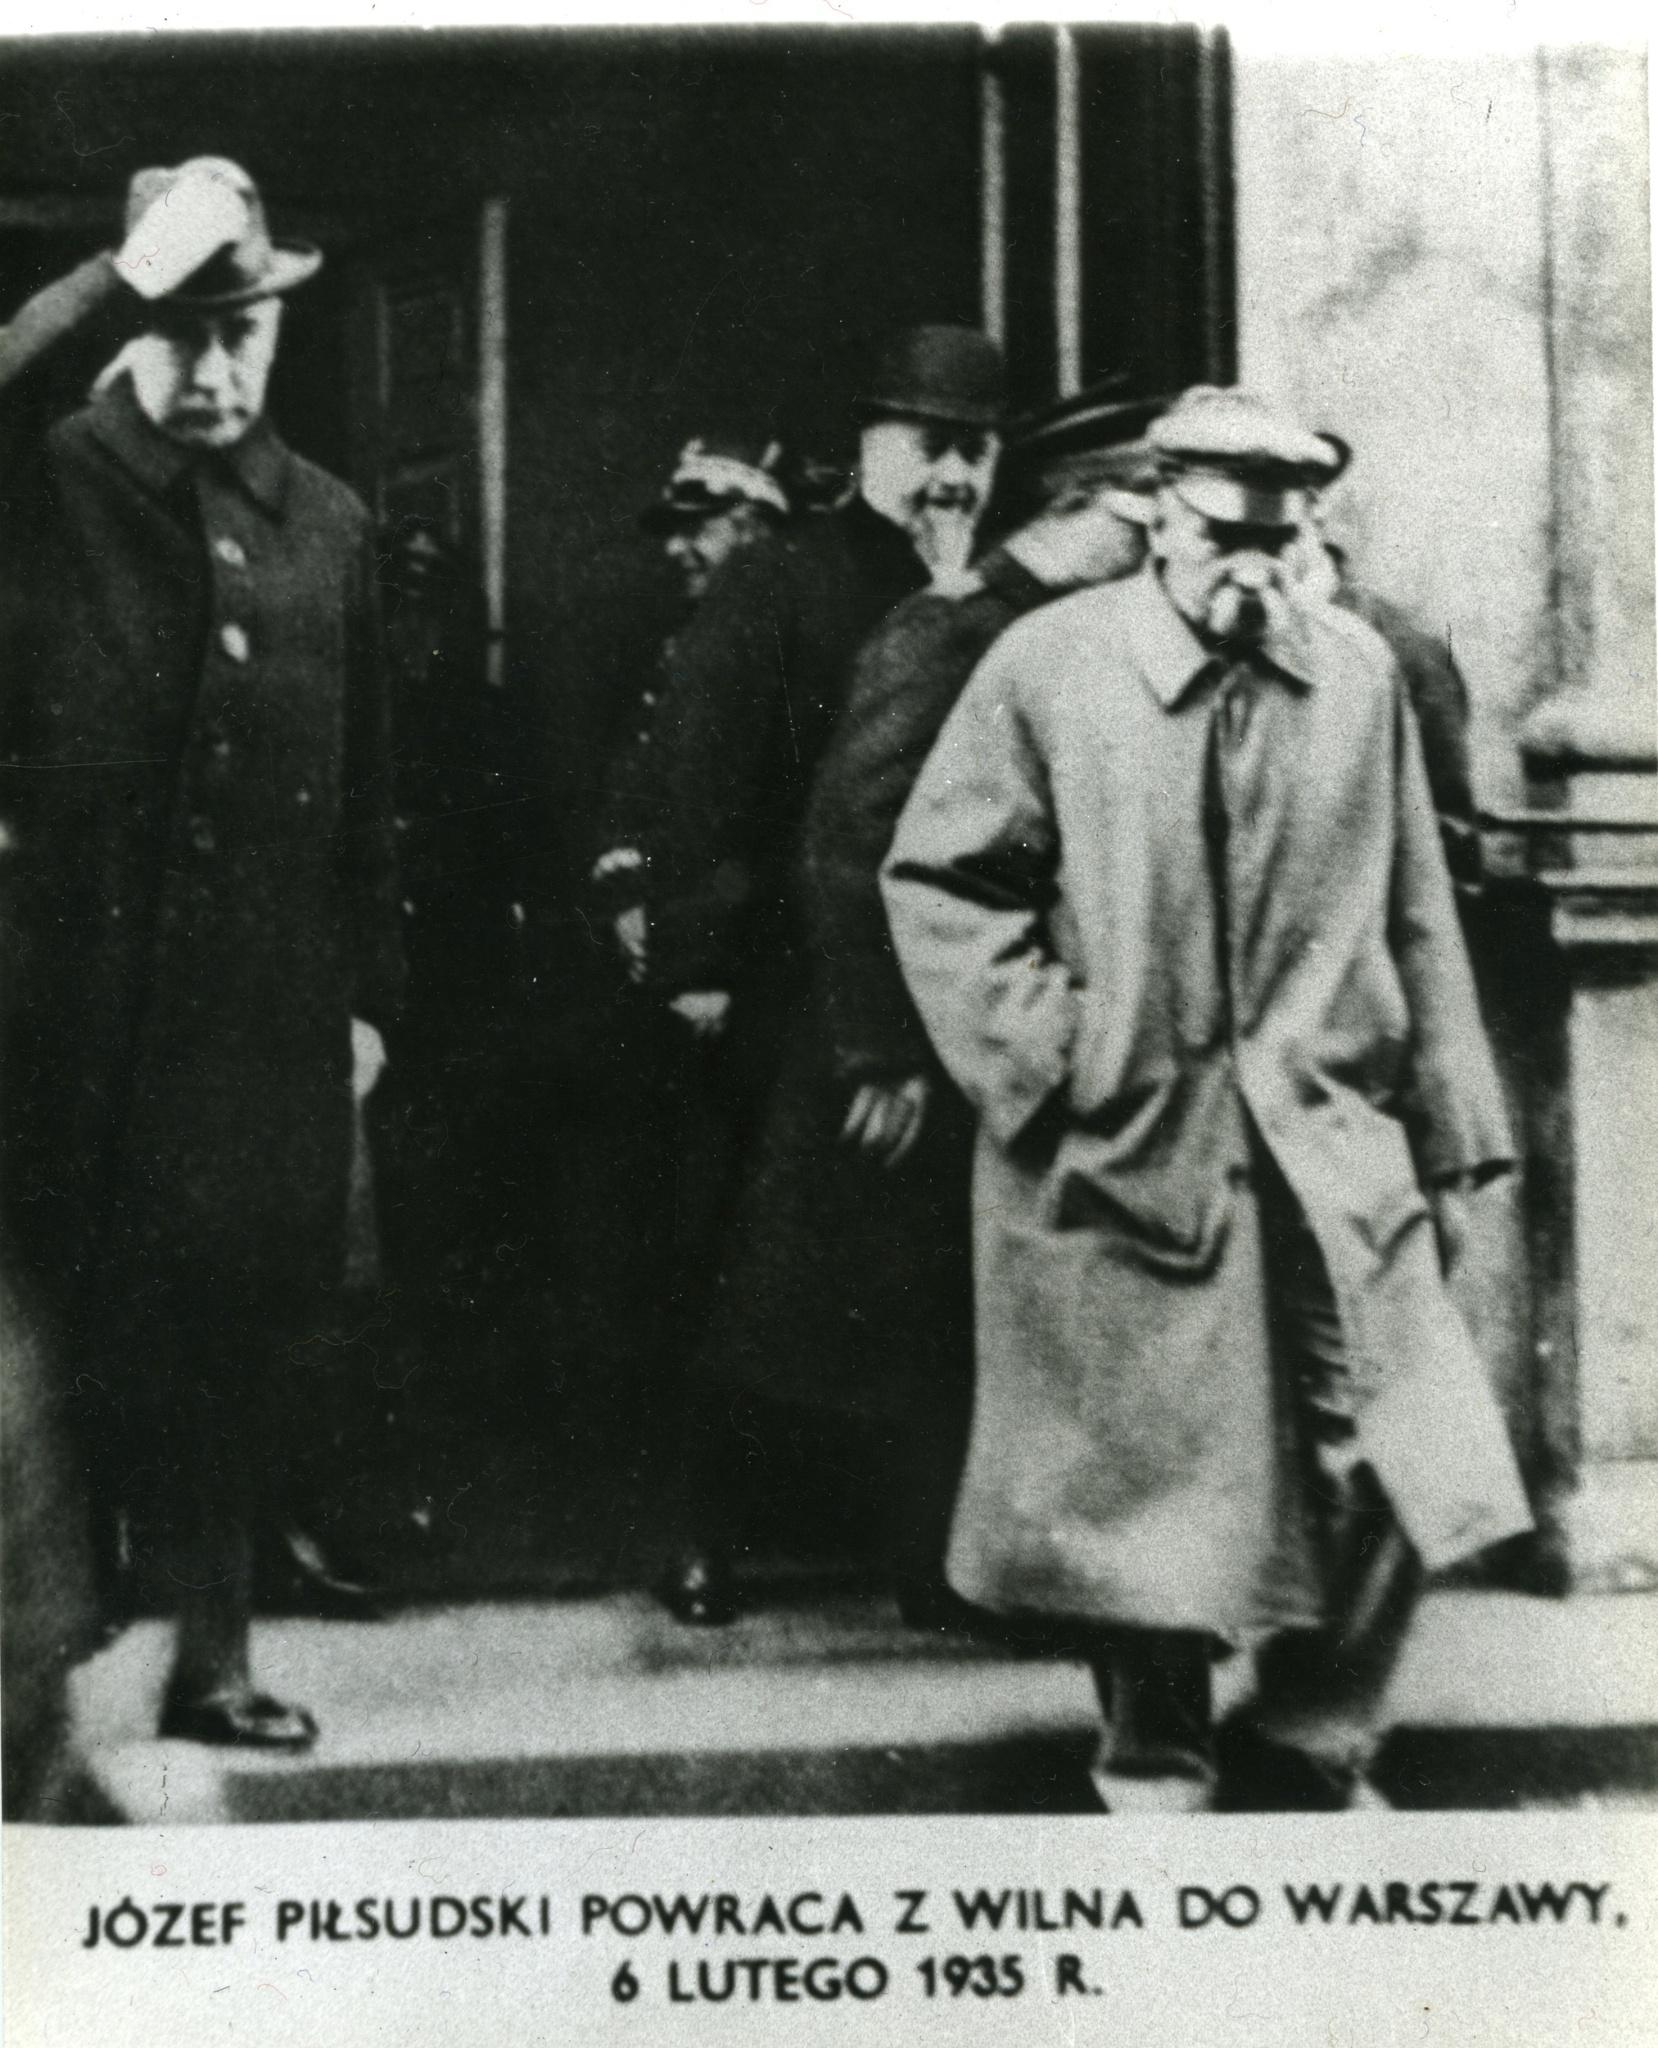 <div class='inner-box'><div class='close-desc'></div><span class='opis'>J&oacute;zef Piłsudski wraca z Wilna do Warszawy. 6 lutego 1935</span><div class='clearfix'></div><span>Sygn. FIL03174</span><div class='clearfix'></div><span>&copy; Instytut Literacki</span></div>